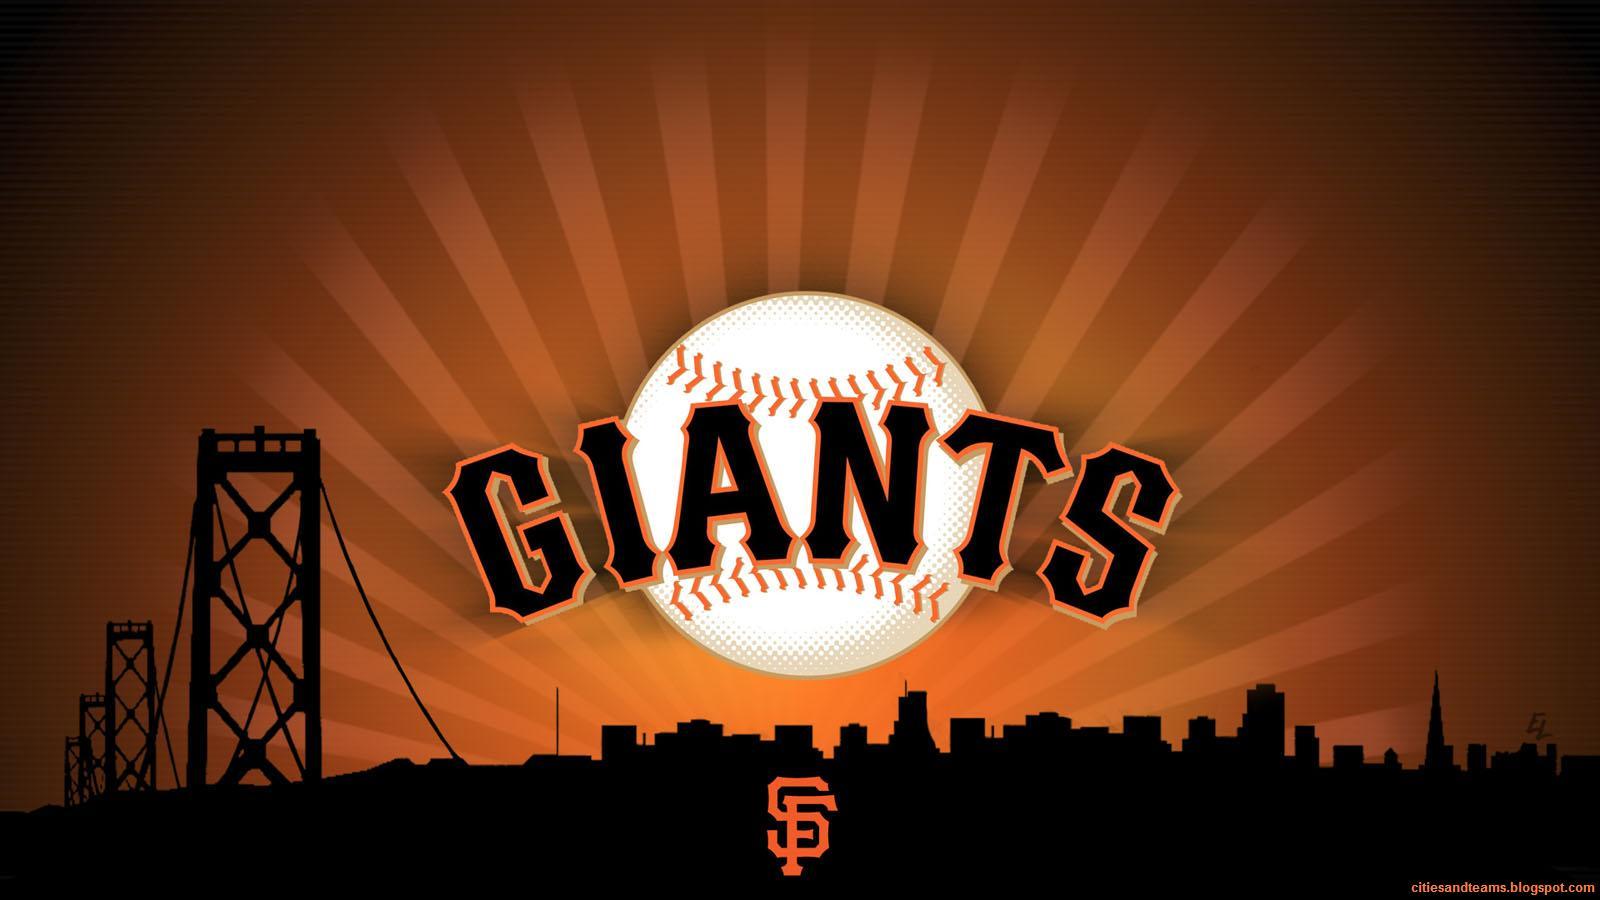 MLB United States Hd Desktop Wallpaper citiesandteamsblogspotcomjpg 1600x900